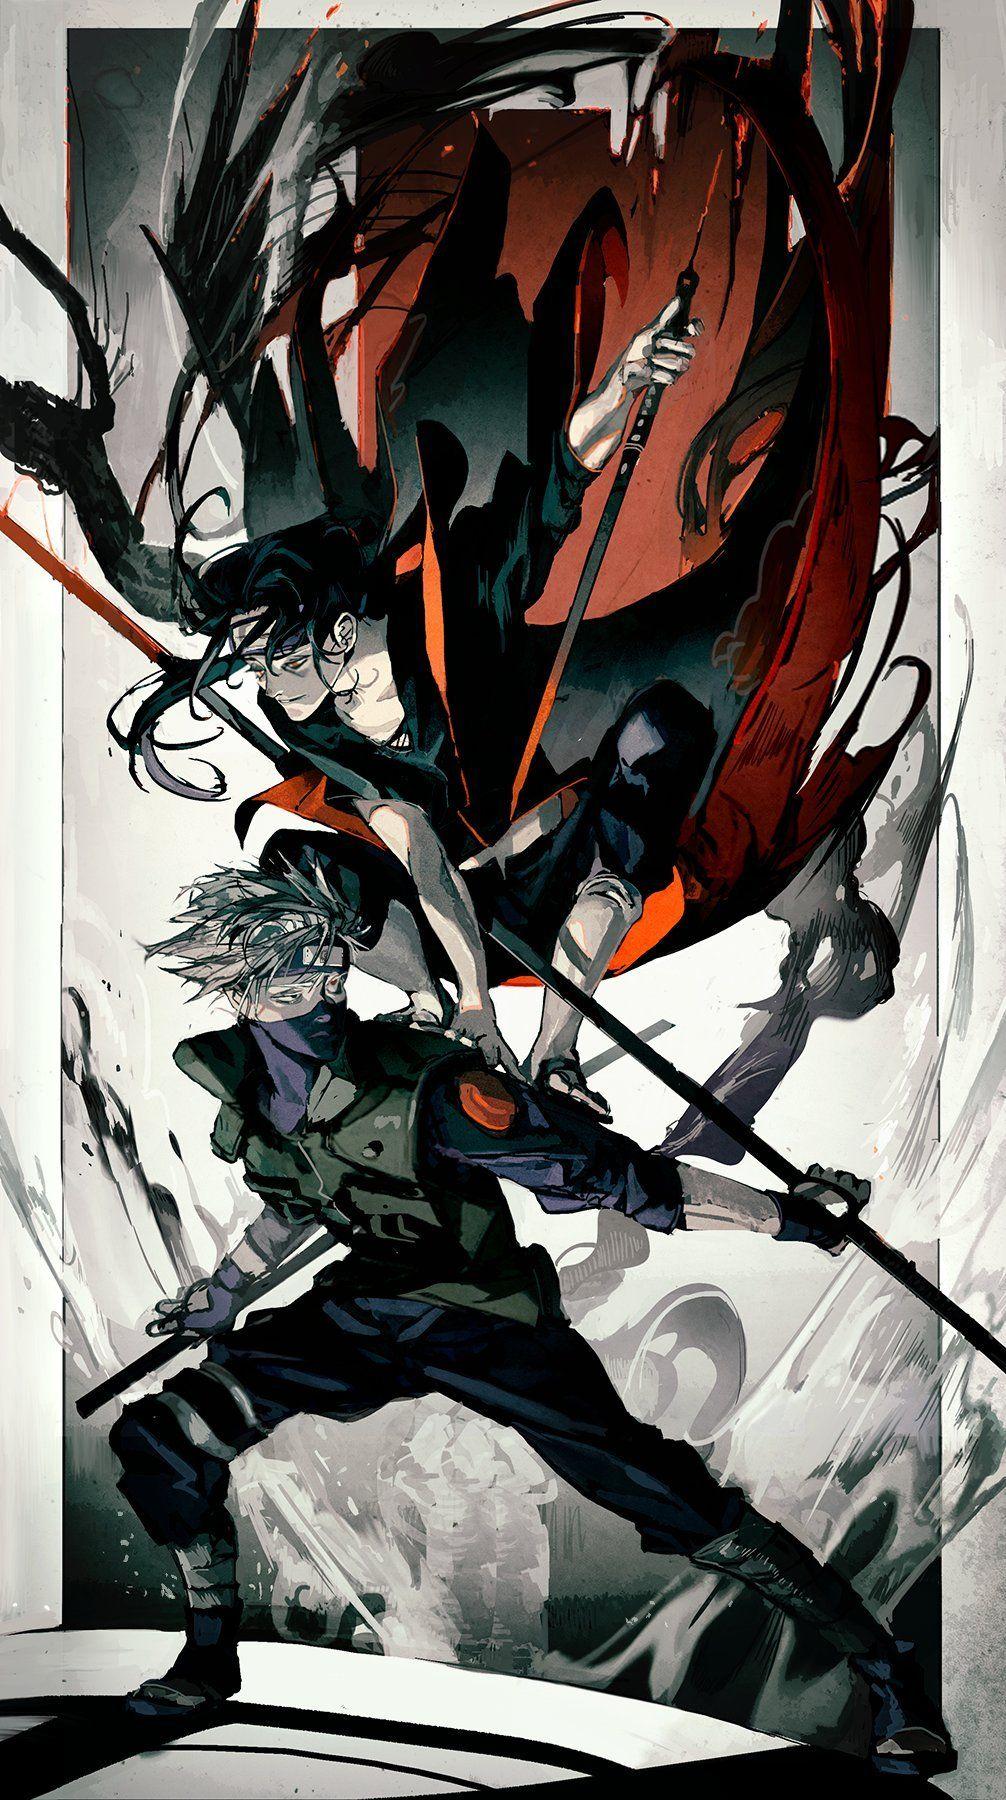 Kakashi and Itachi Artwork by Dibdub1 Anime naruto